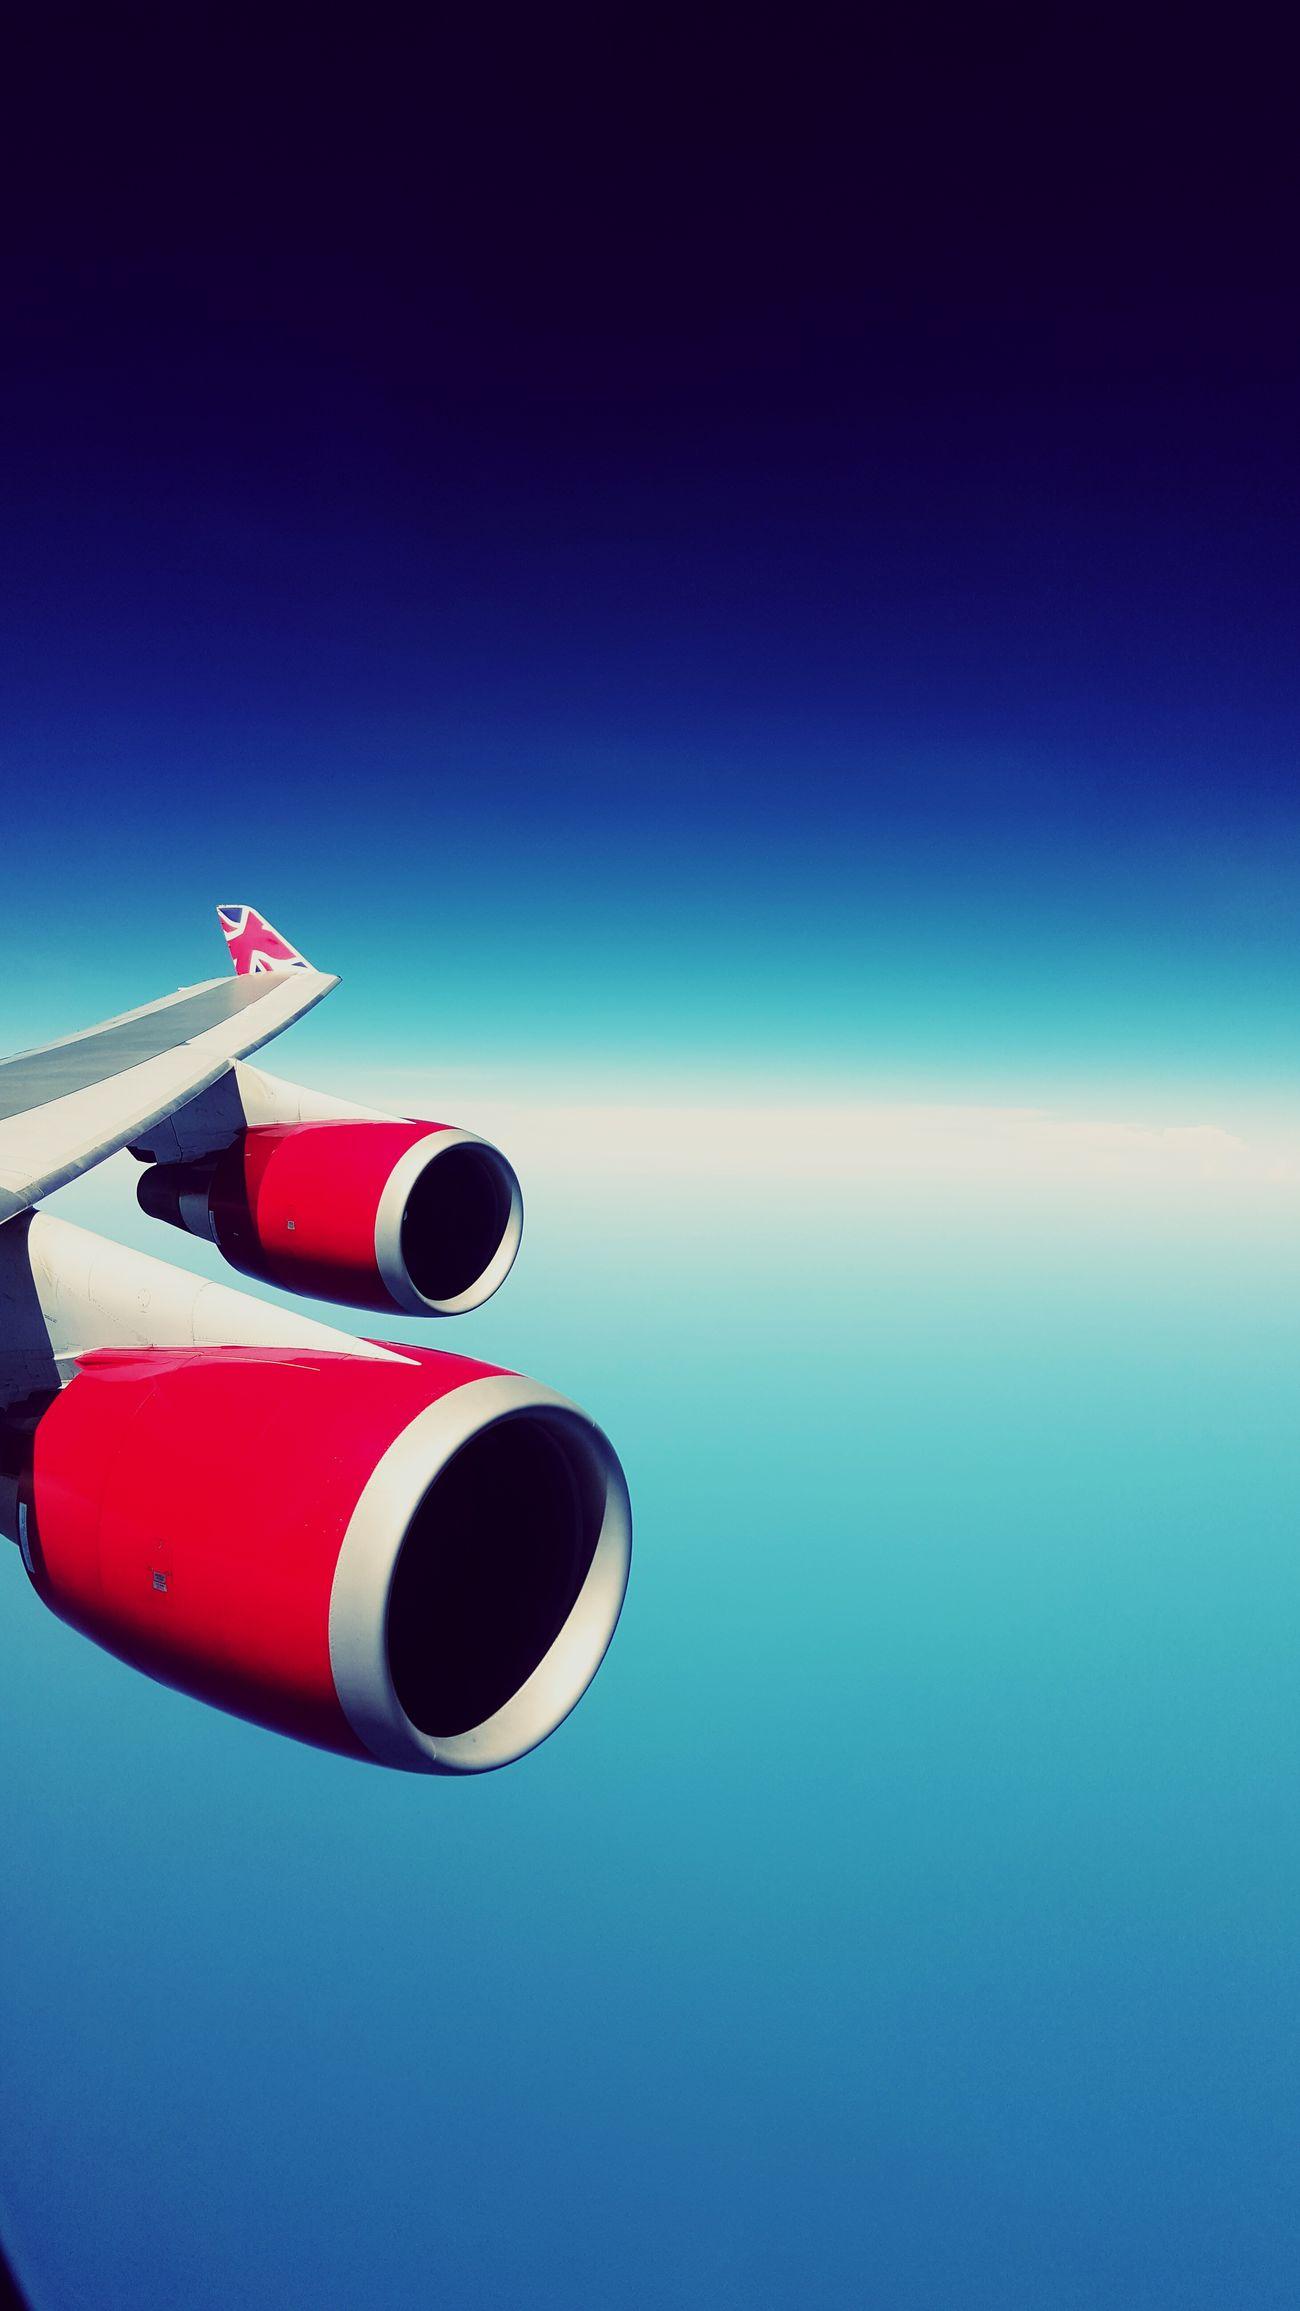 From An Airplane Window Plane View Orlando 2016 Hi Slp Family Vacation Quality Time Virgin Atlantic Boeing 747 Jumbojet Crossing The Atlantic